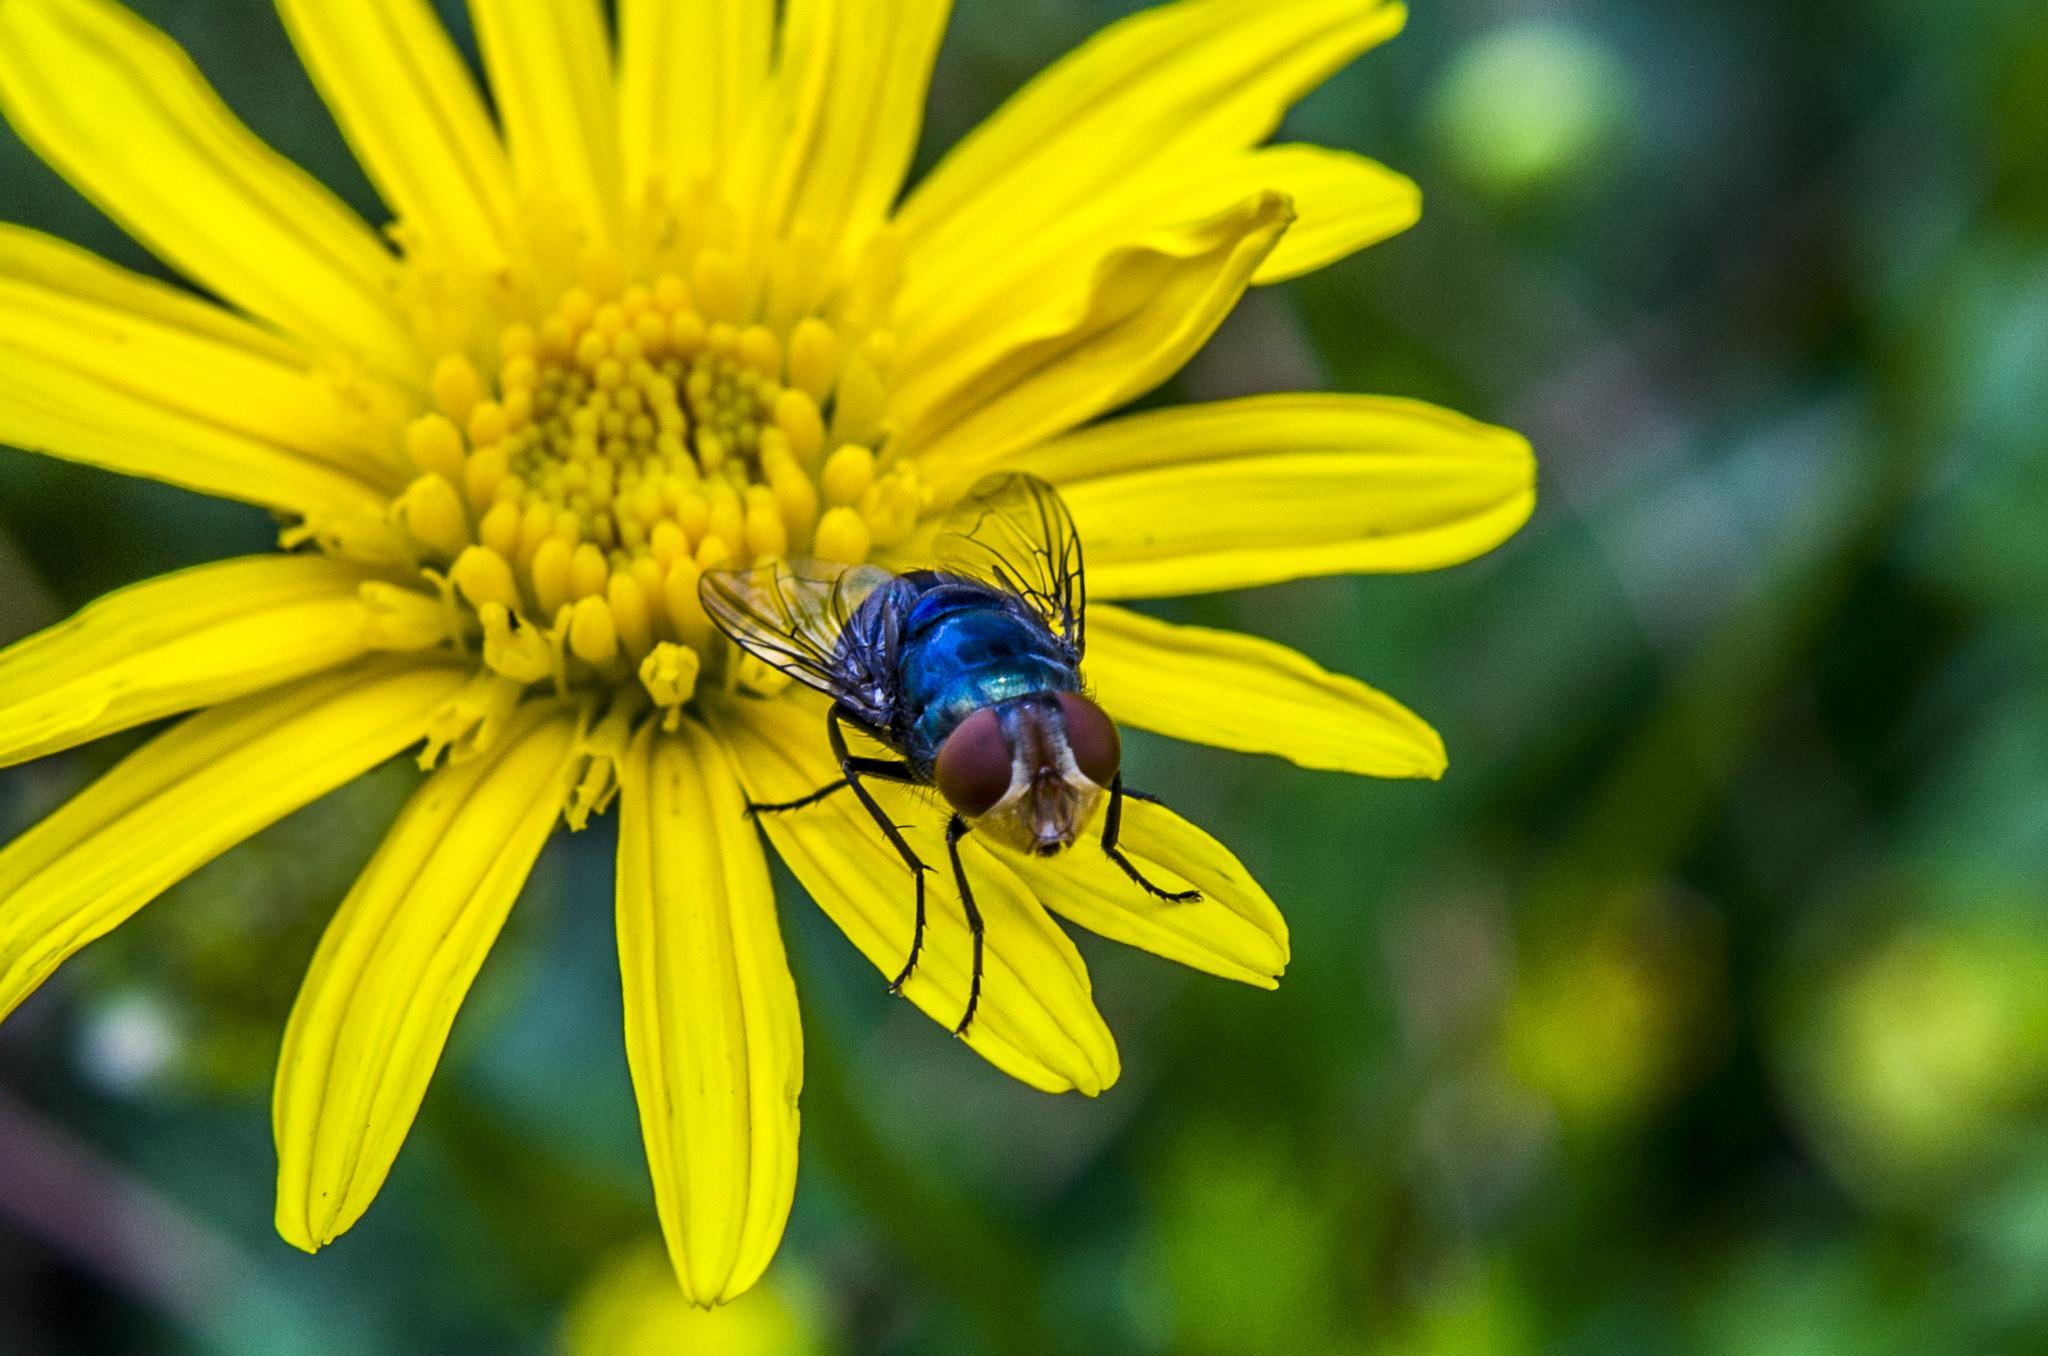 Blue back fly by BearMan